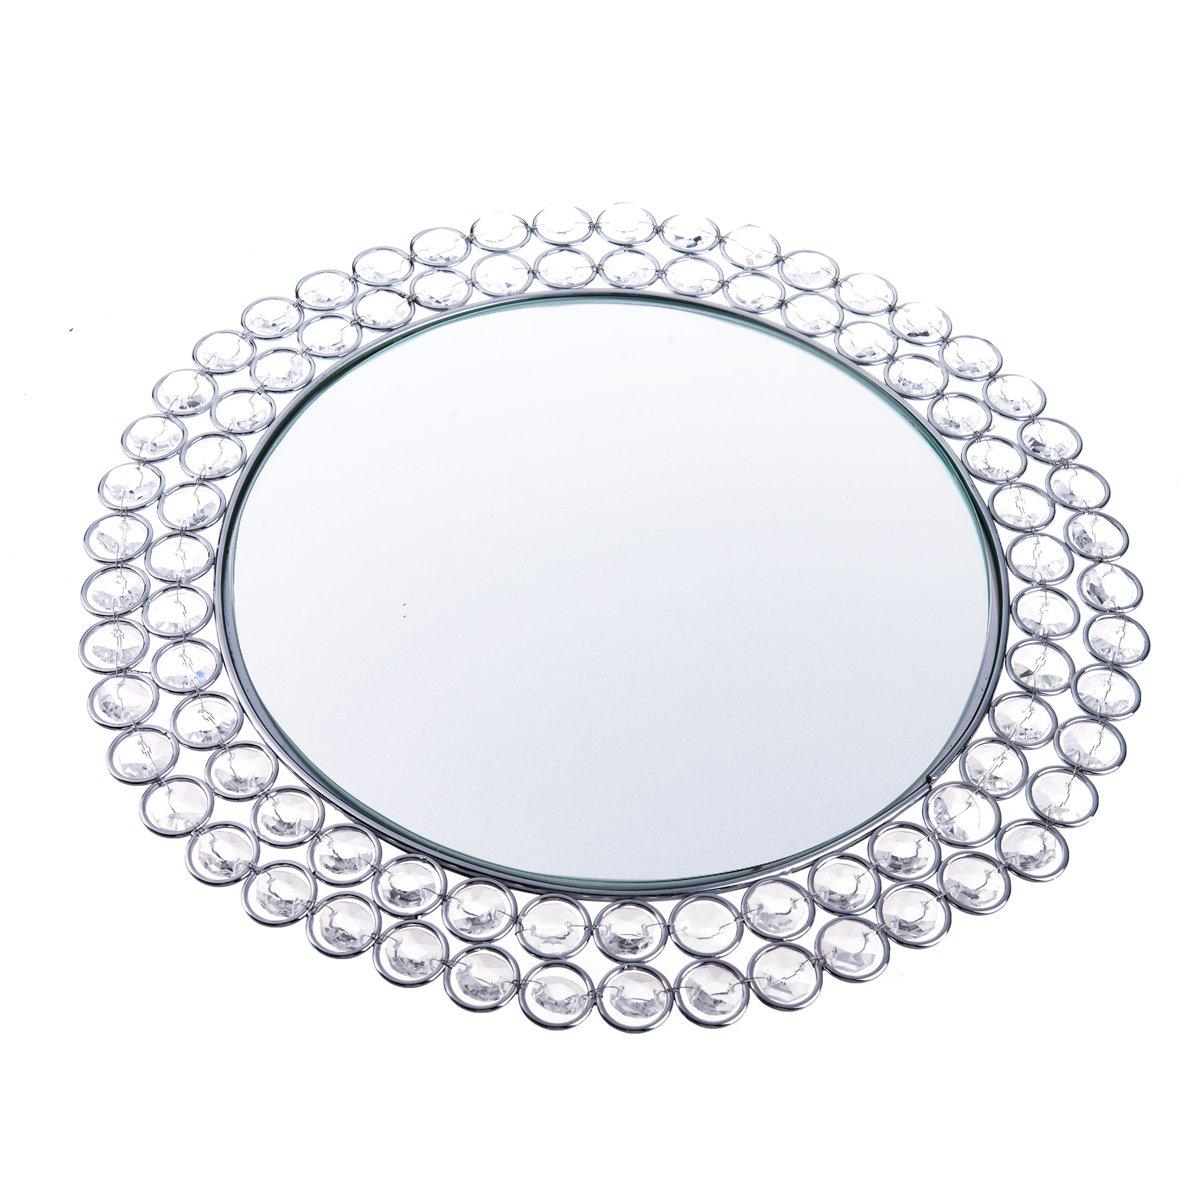 Feyarl Crystal Mirrored Jewelry Tray Cosmetic Organizer Vanity Tray Decorative Tray (Silver) by Feyarl (Image #2)